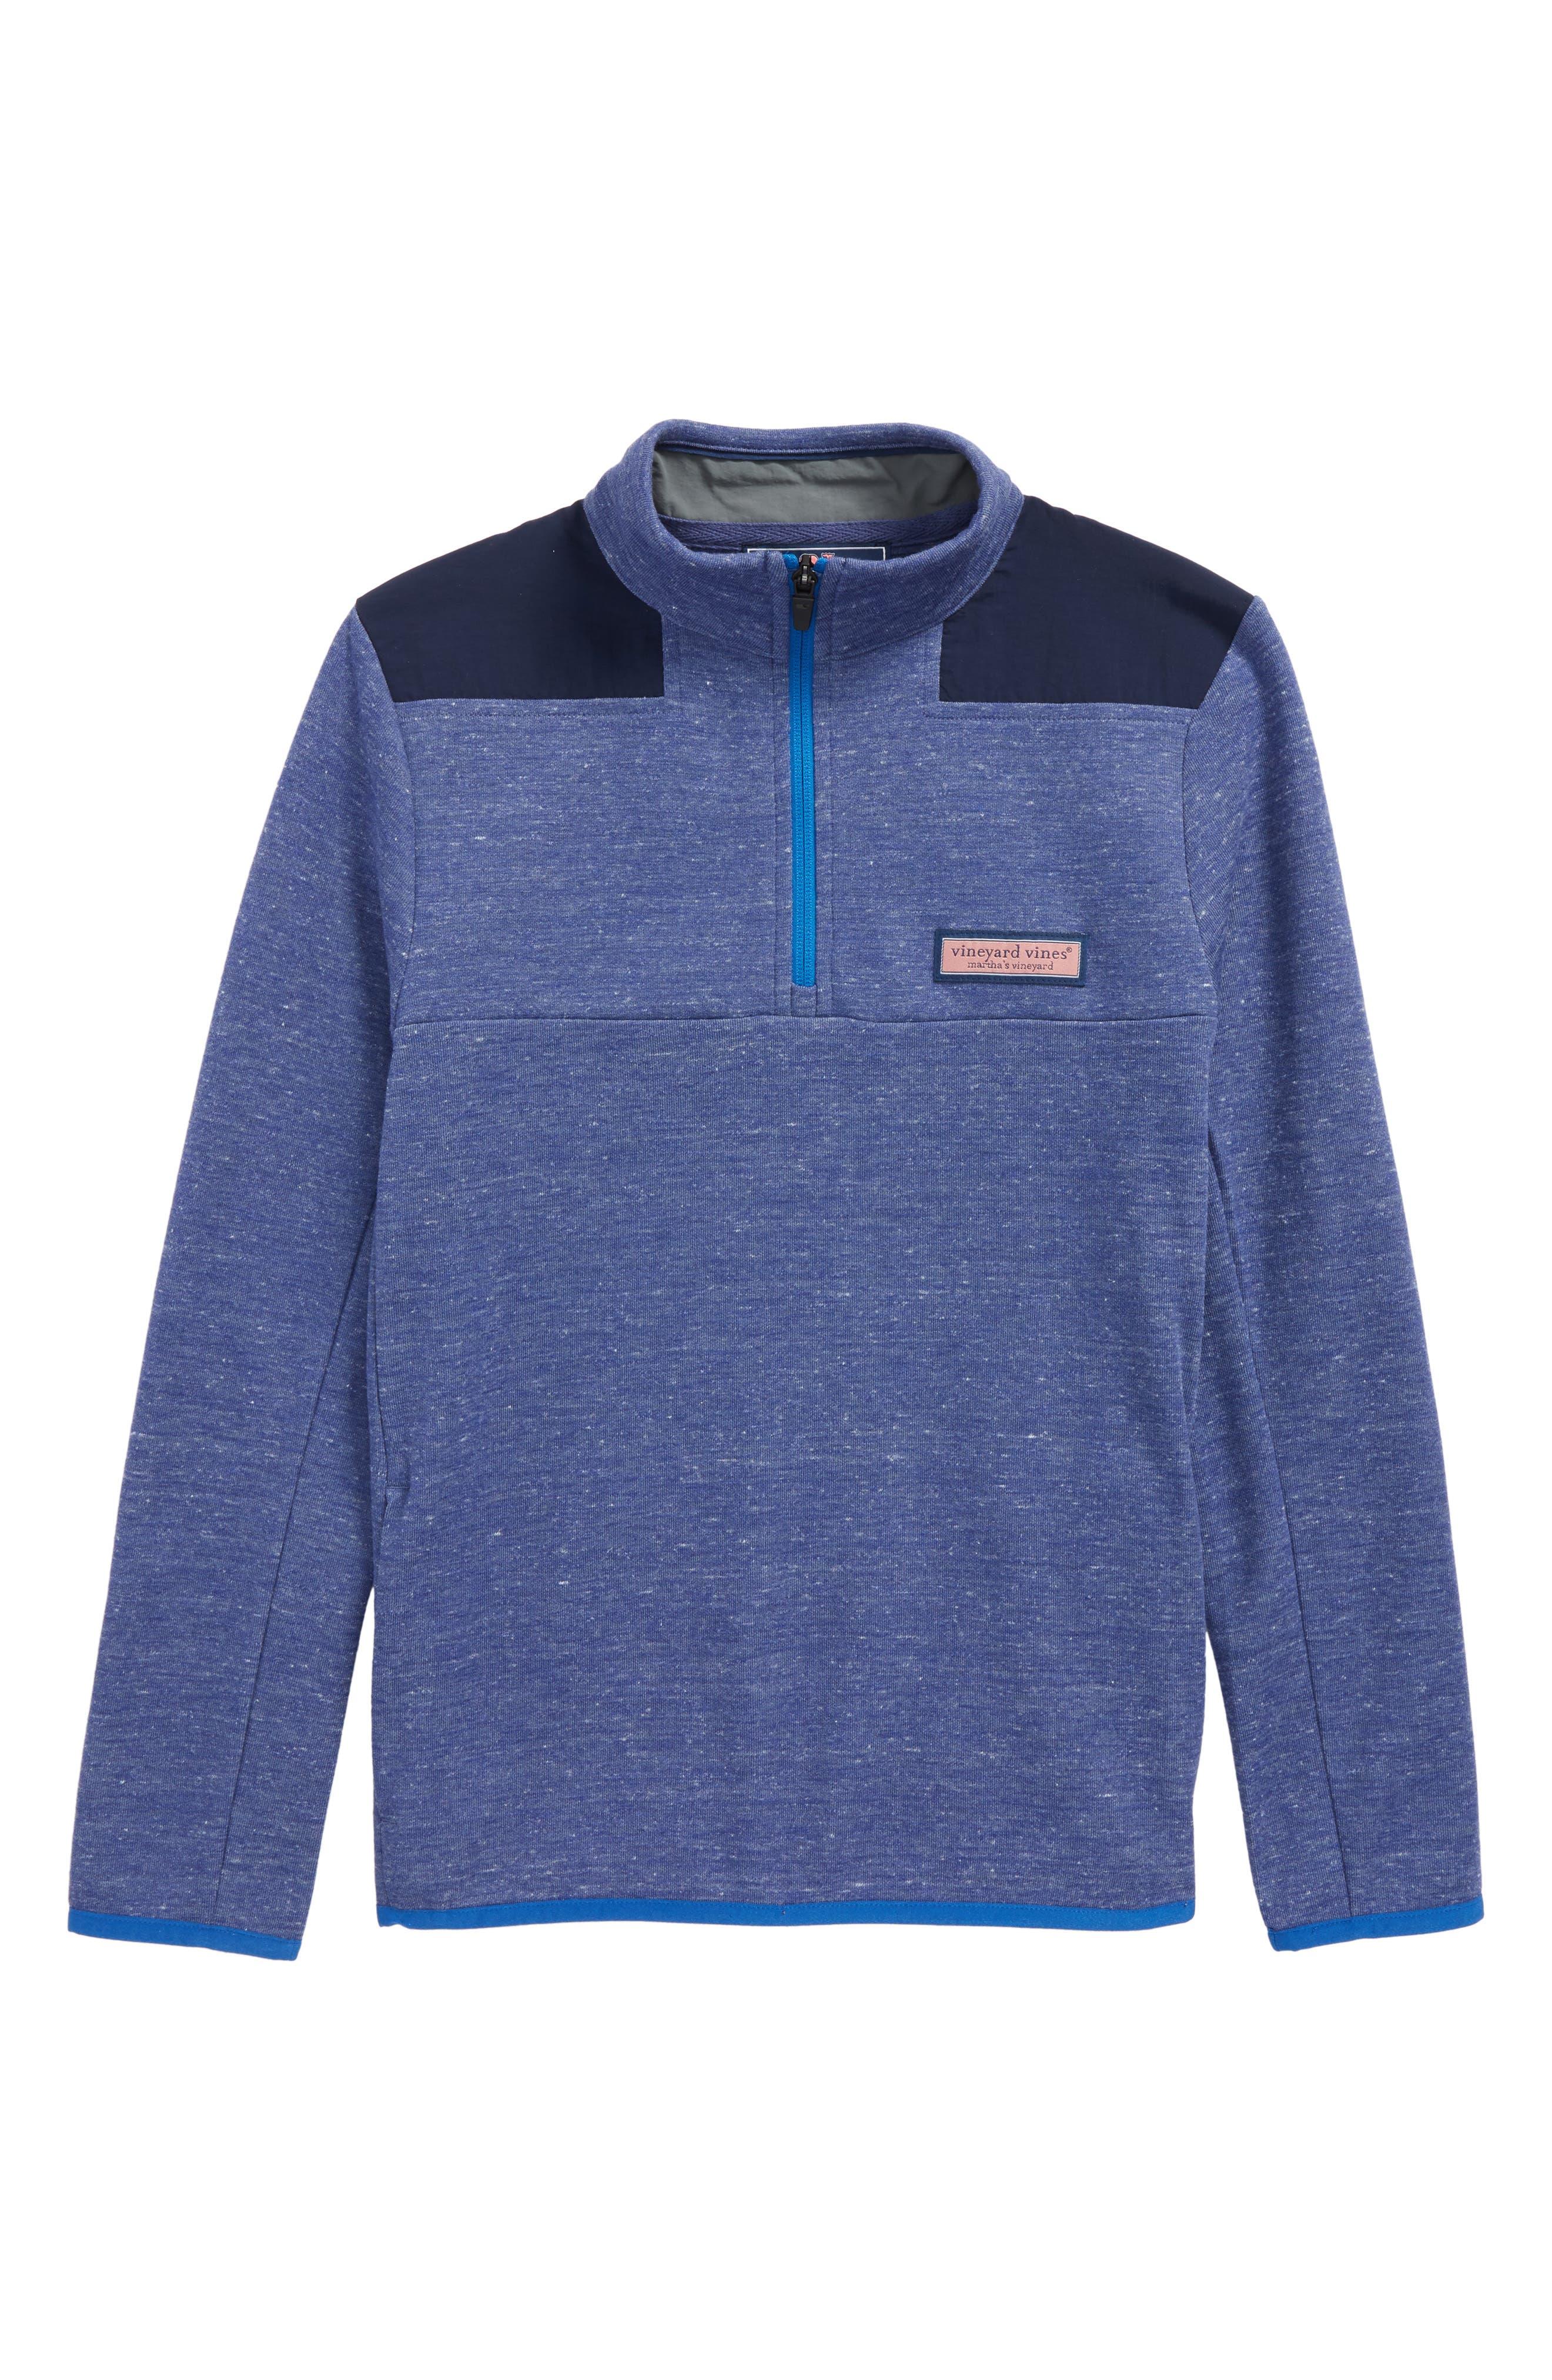 Mesh Shep Quarter Zip Pullover,                             Main thumbnail 1, color,                             405